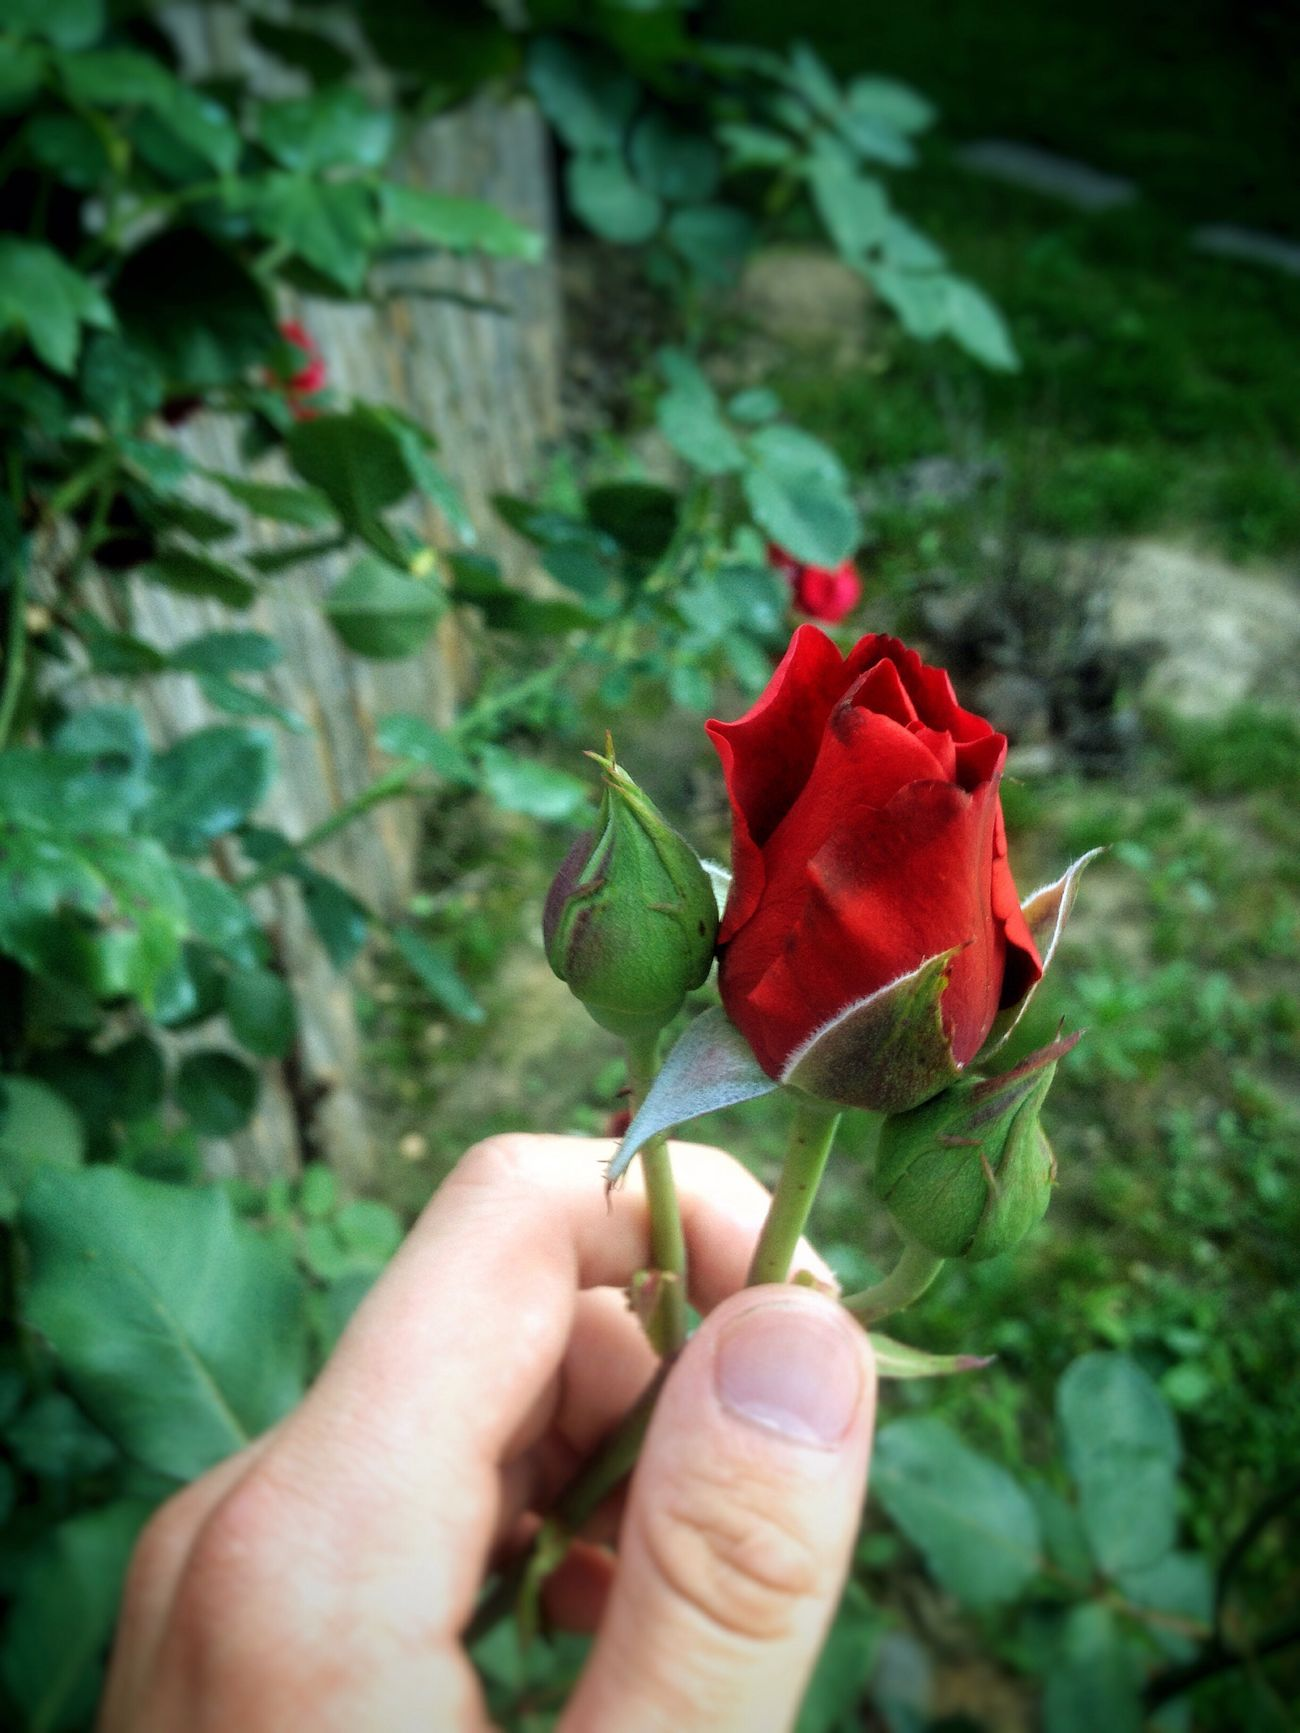 Rose🌹 Beauty In Nature Favoriteflower Romantic